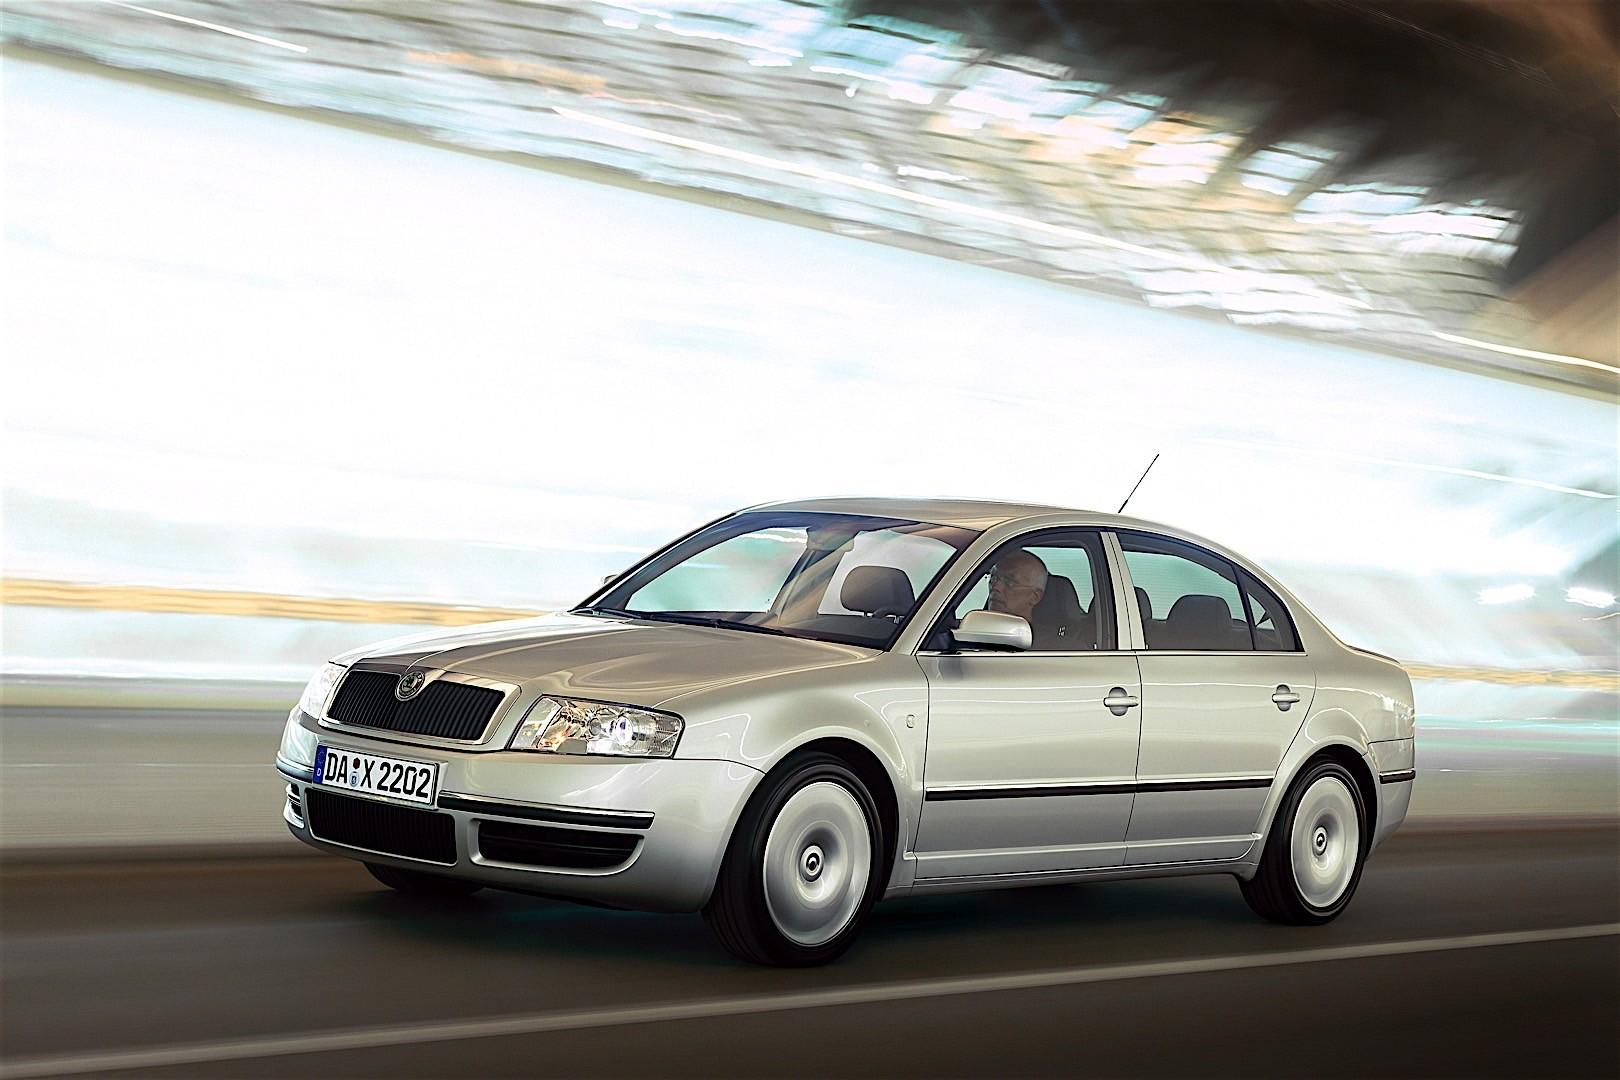 SKODA Superb - 2002, 2003, 2004, 2005, 2006 - autoevolution